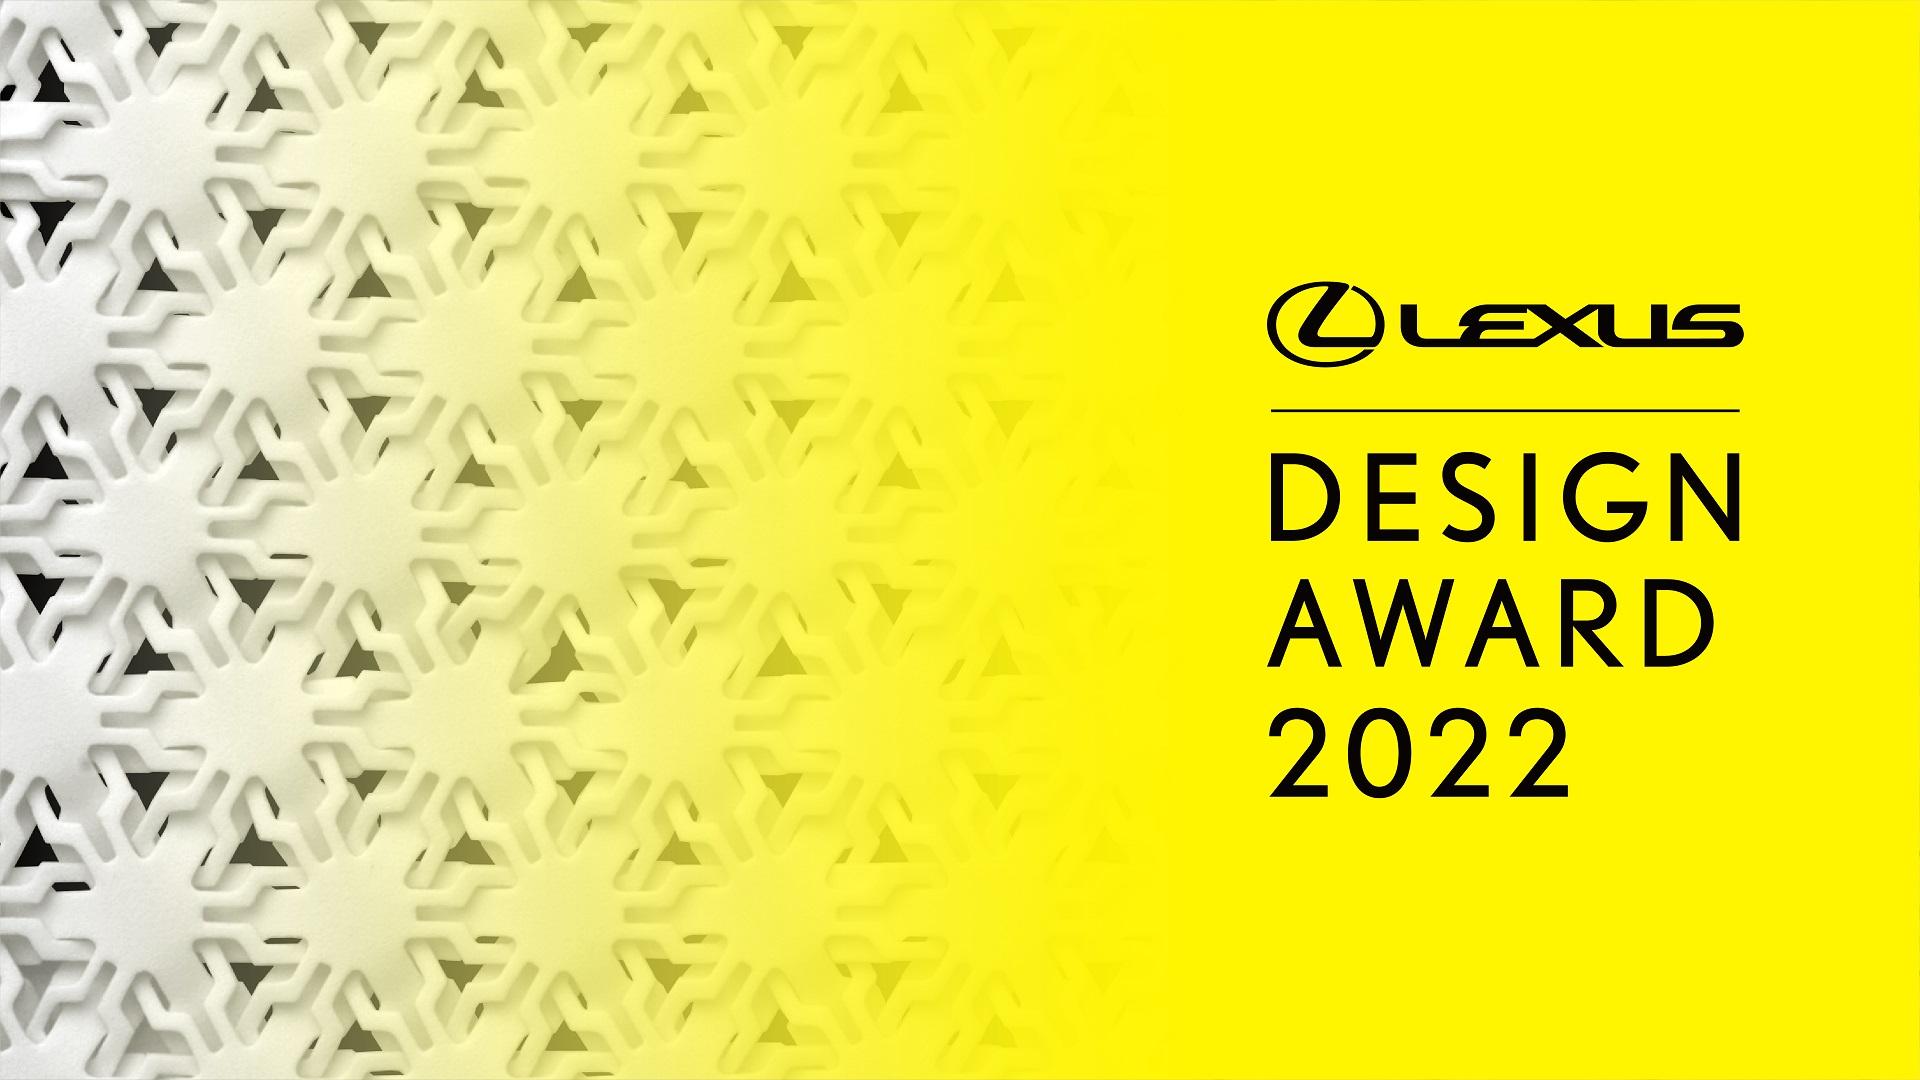 Lexus Design Award 2022 candidaturas abertas Image